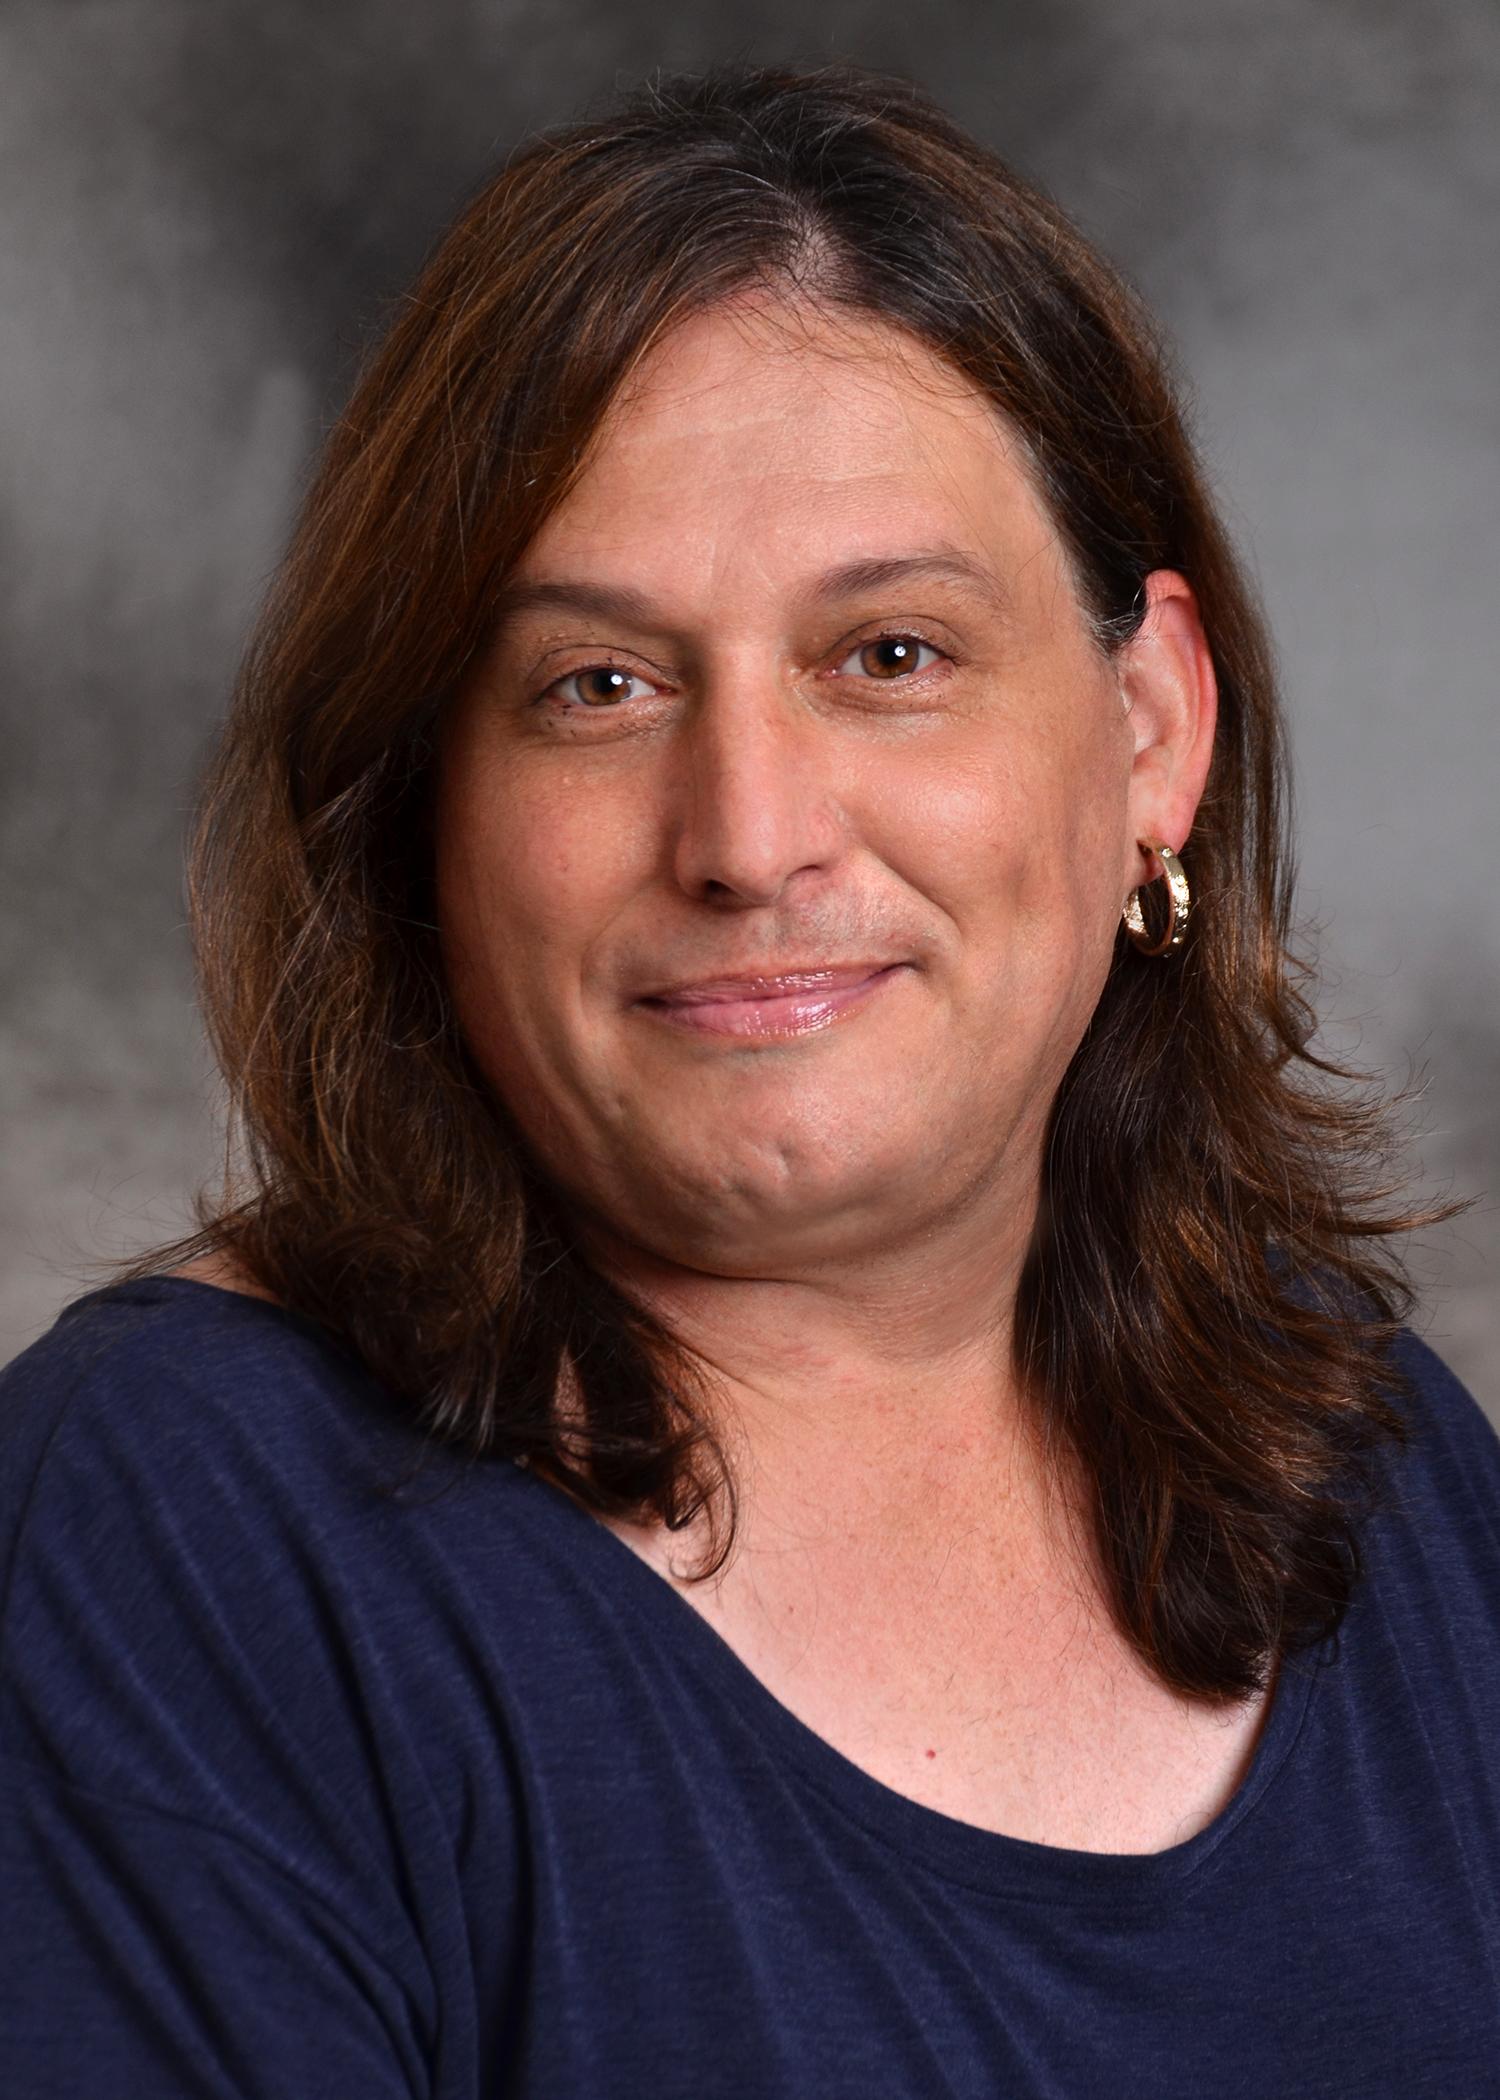 Samantha Bartosz  - Deputy Director of Litigation,  Children's Rights